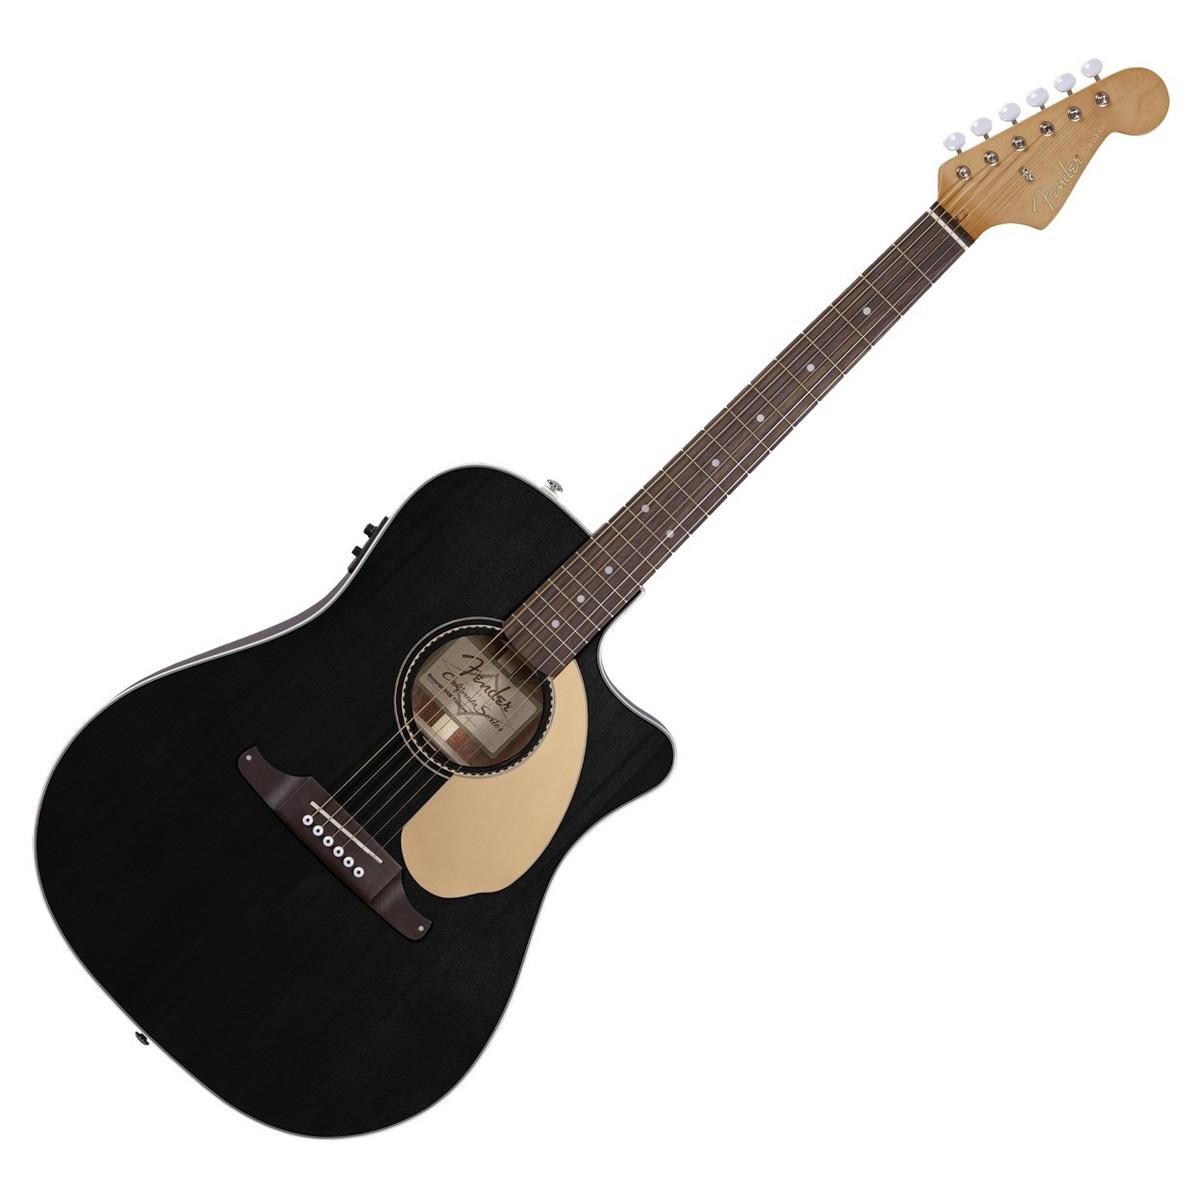 fender sonoran sce thinline guitare electro acoustique noir. Black Bedroom Furniture Sets. Home Design Ideas